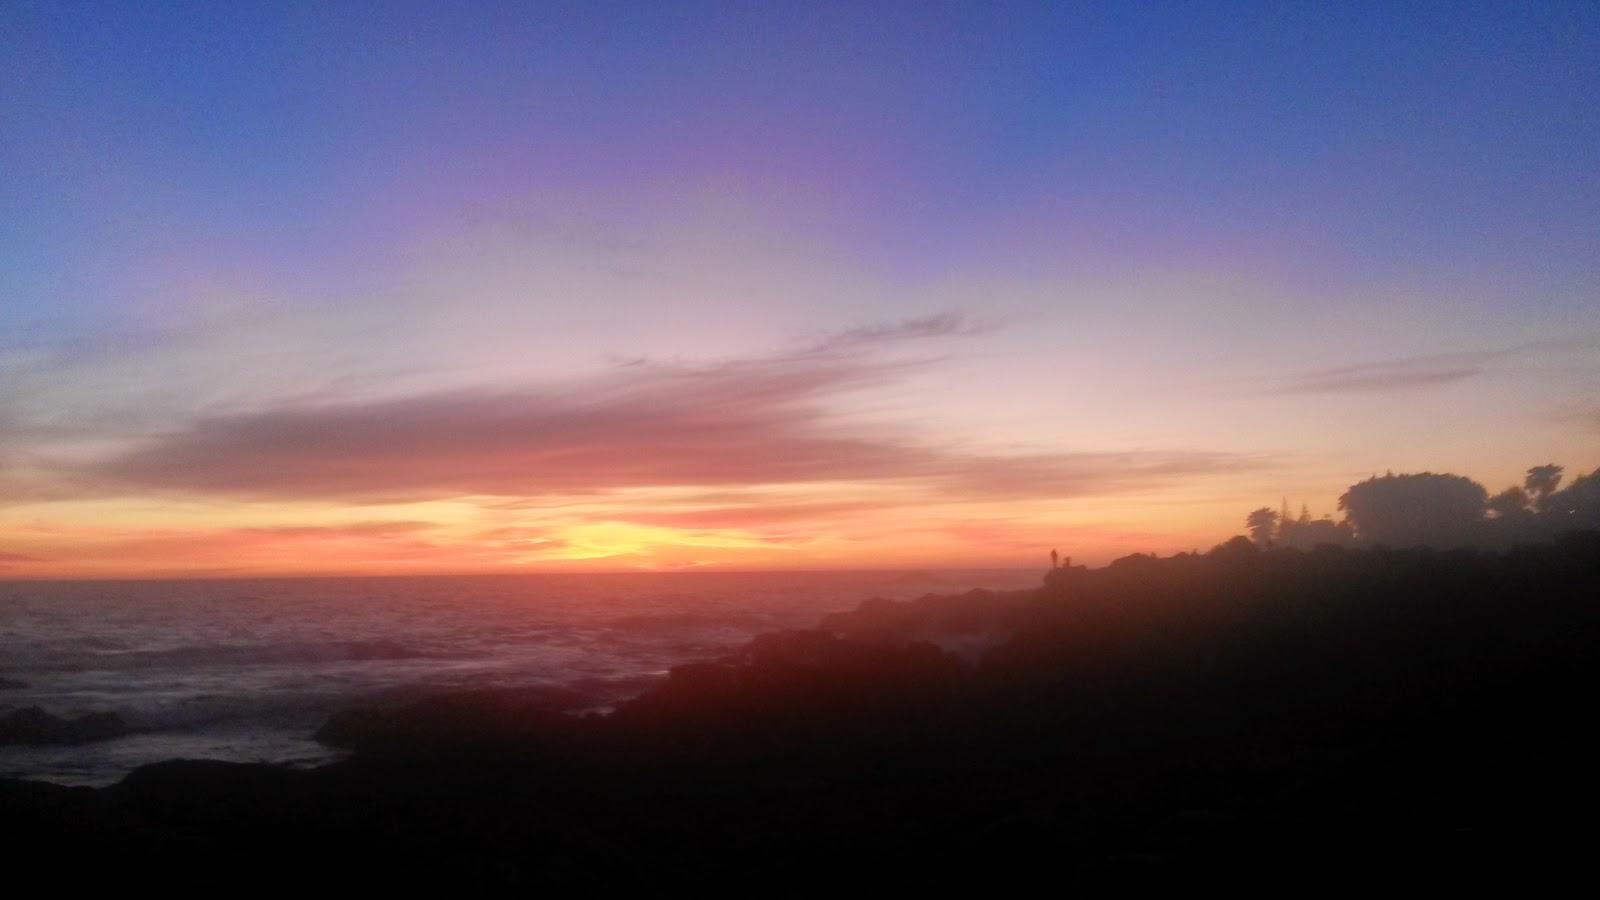 isla-negra-casa-neruda-tramonto